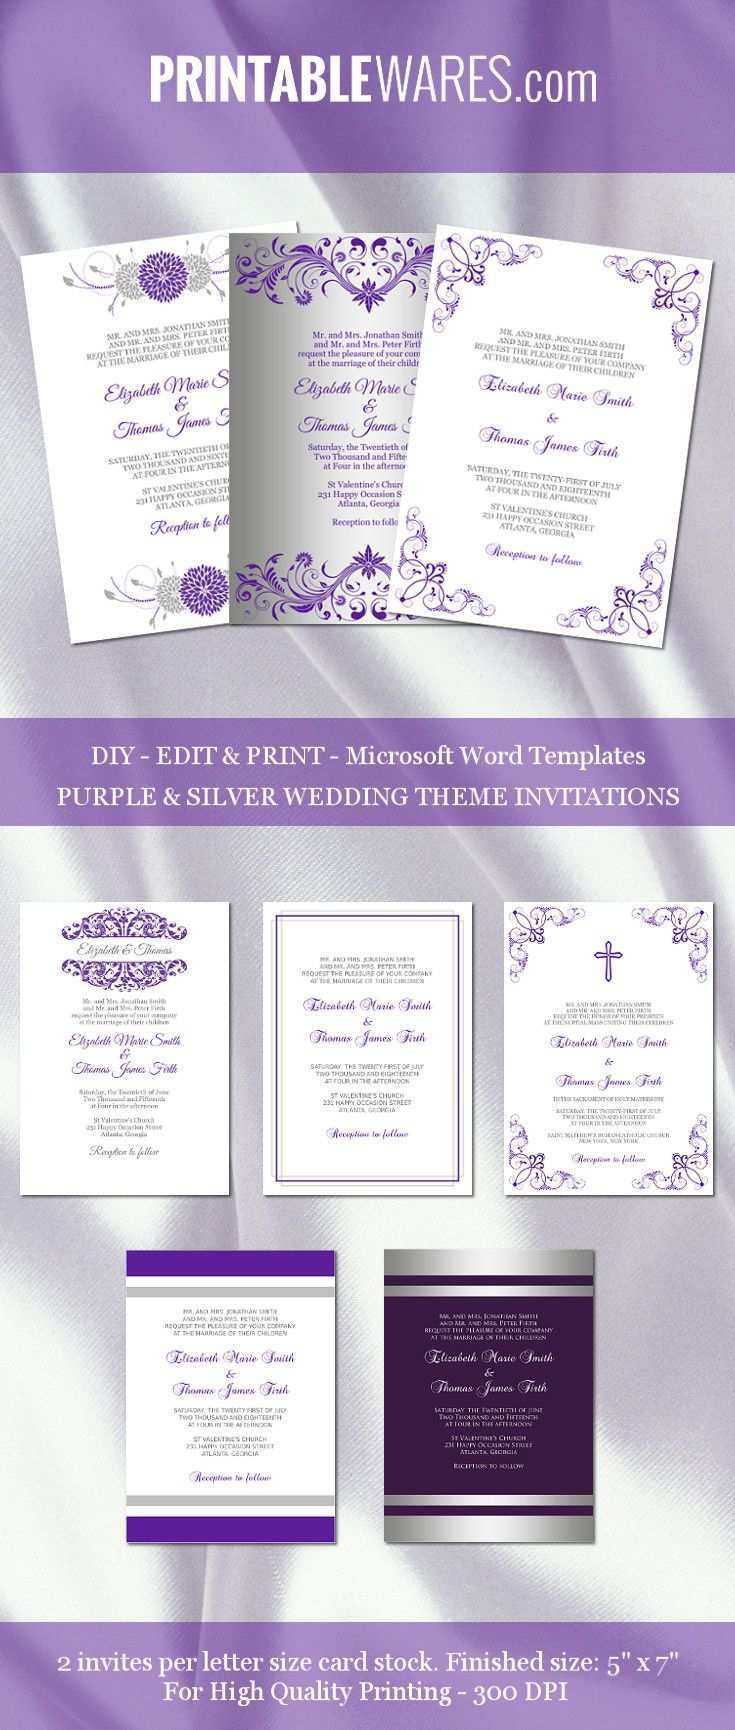 57 Blank Wedding Invitation Templates Violet With Stunning Design for Wedding Invitation Templates Violet